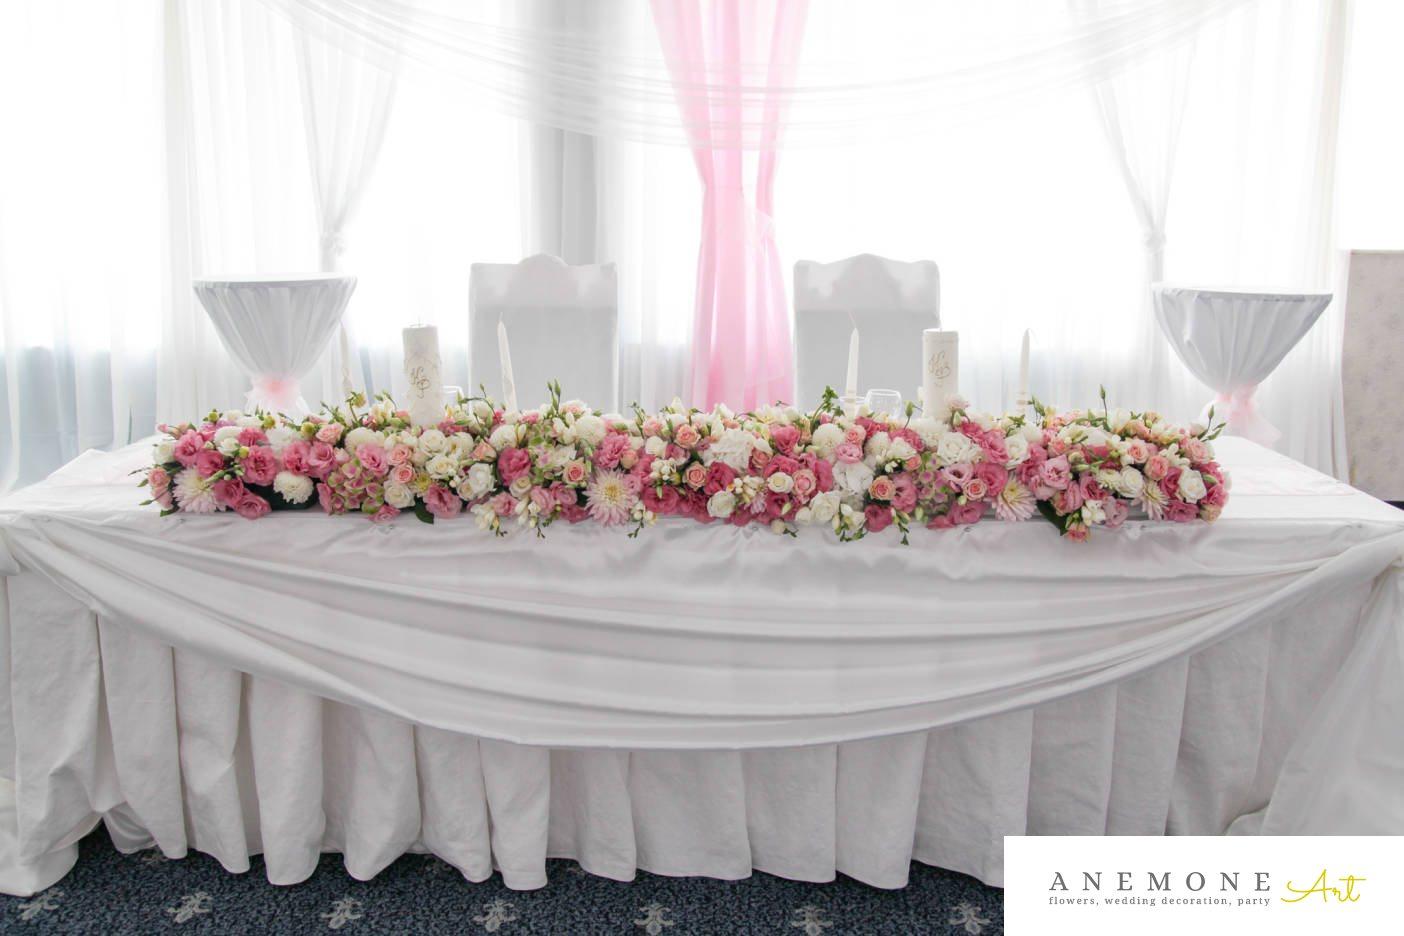 Poza, foto cu Flori de nunta alb, dalia, decor masa, frezii, ghirlanda flori, lisianthus, lumanare, roz, trandafiri in Arad, Timisoara, Oradea (wedding flowers, bouquets) nunta Arad, Timisoara, Oradea